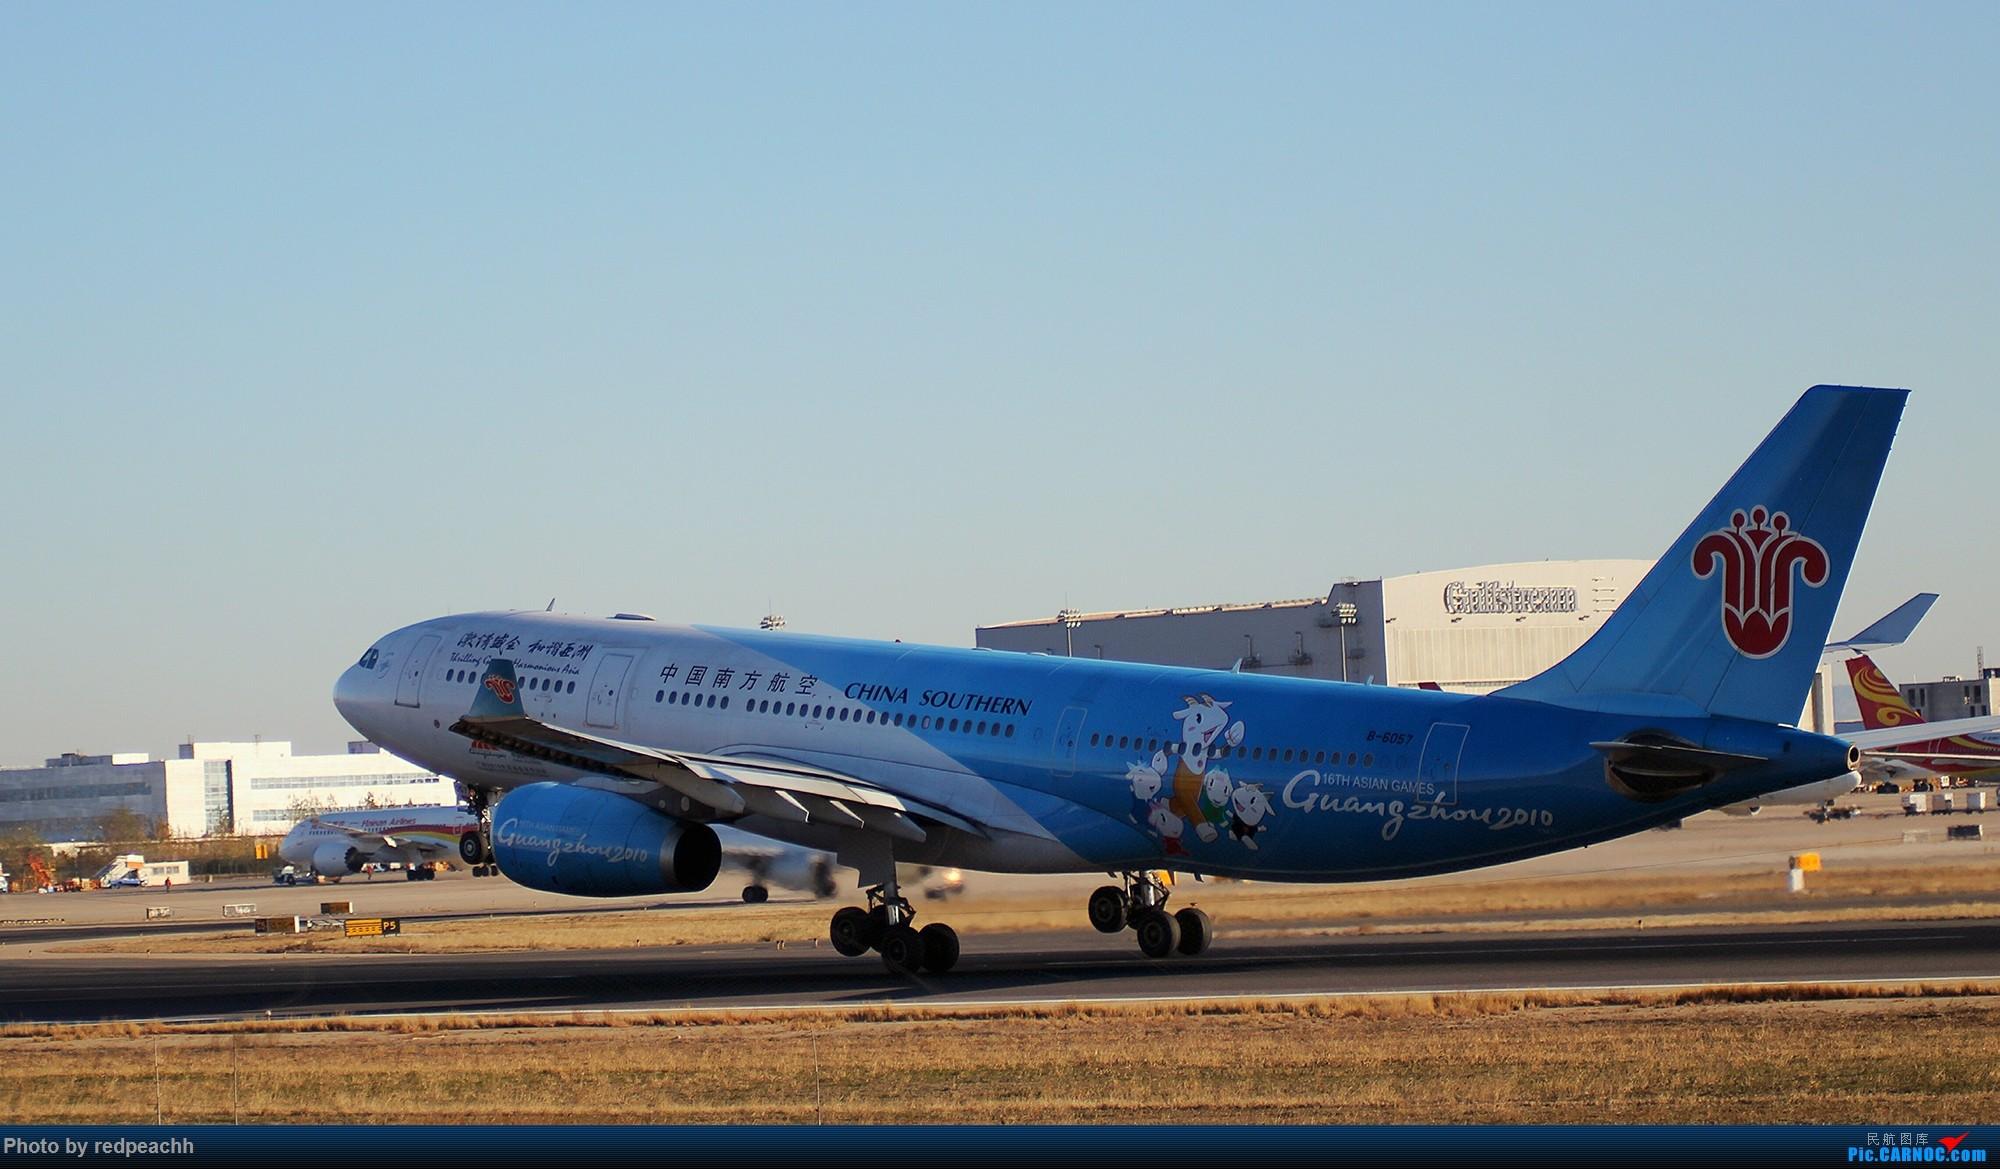 Re:[原创](持续更新)河北人为拍机而首都机场2日游(杨二营、八卦台)虽均为常规货但值得纪念(36L) AIRBUS A330-200 B-6057 中国北京首都国际机场